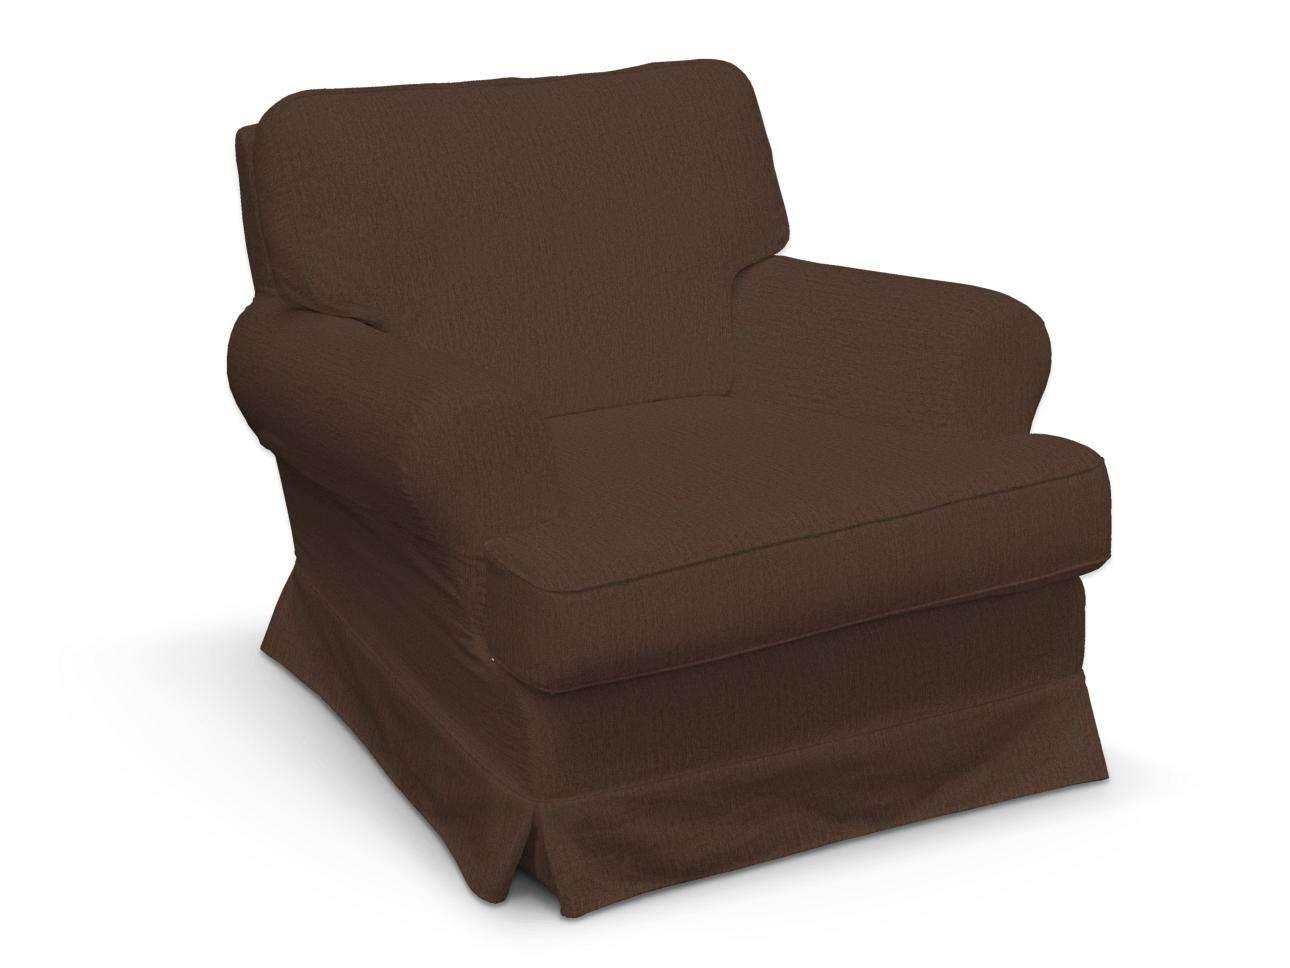 Pokrowiec na fotel Barkaby fotel Barkaby w kolekcji Chenille, tkanina: 702-18